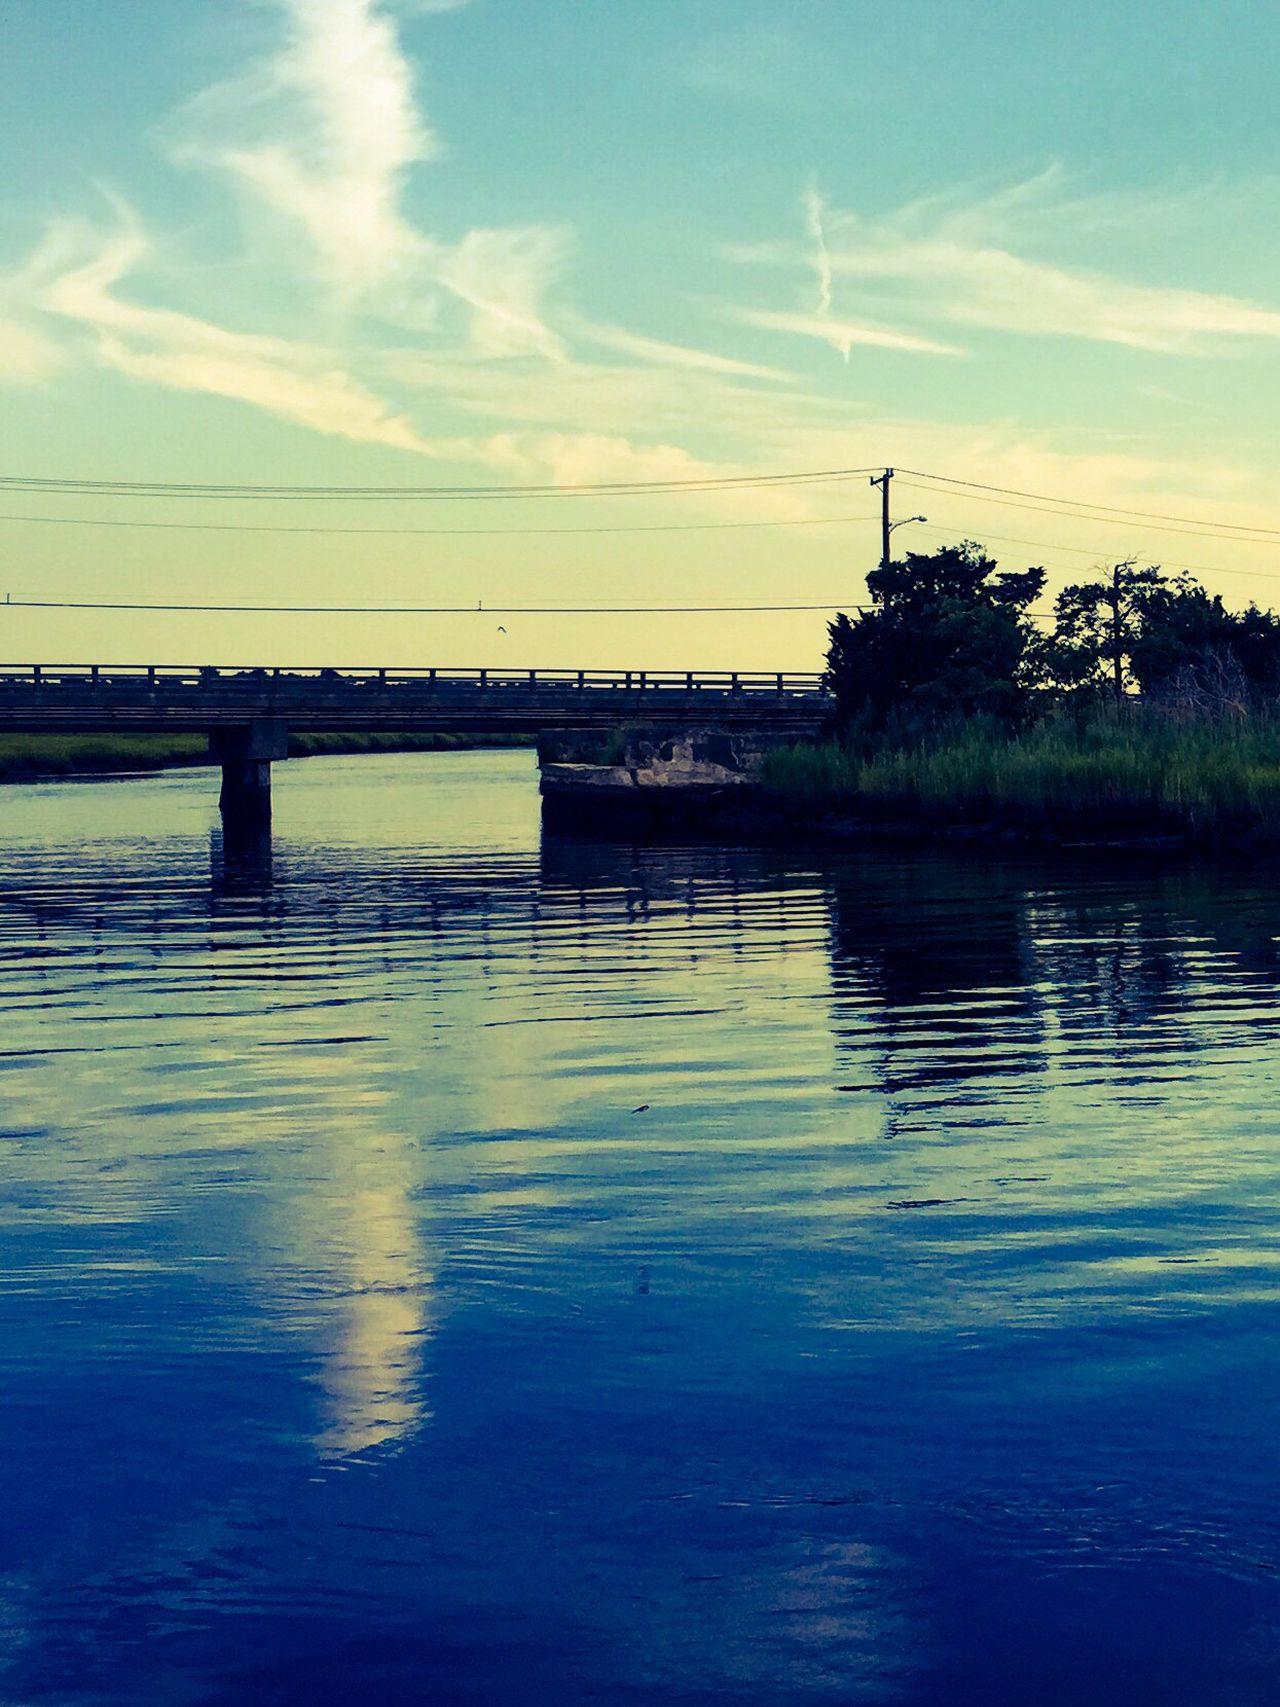 Tuckahoe River Boat Ride Bridge Boatview Water Summer